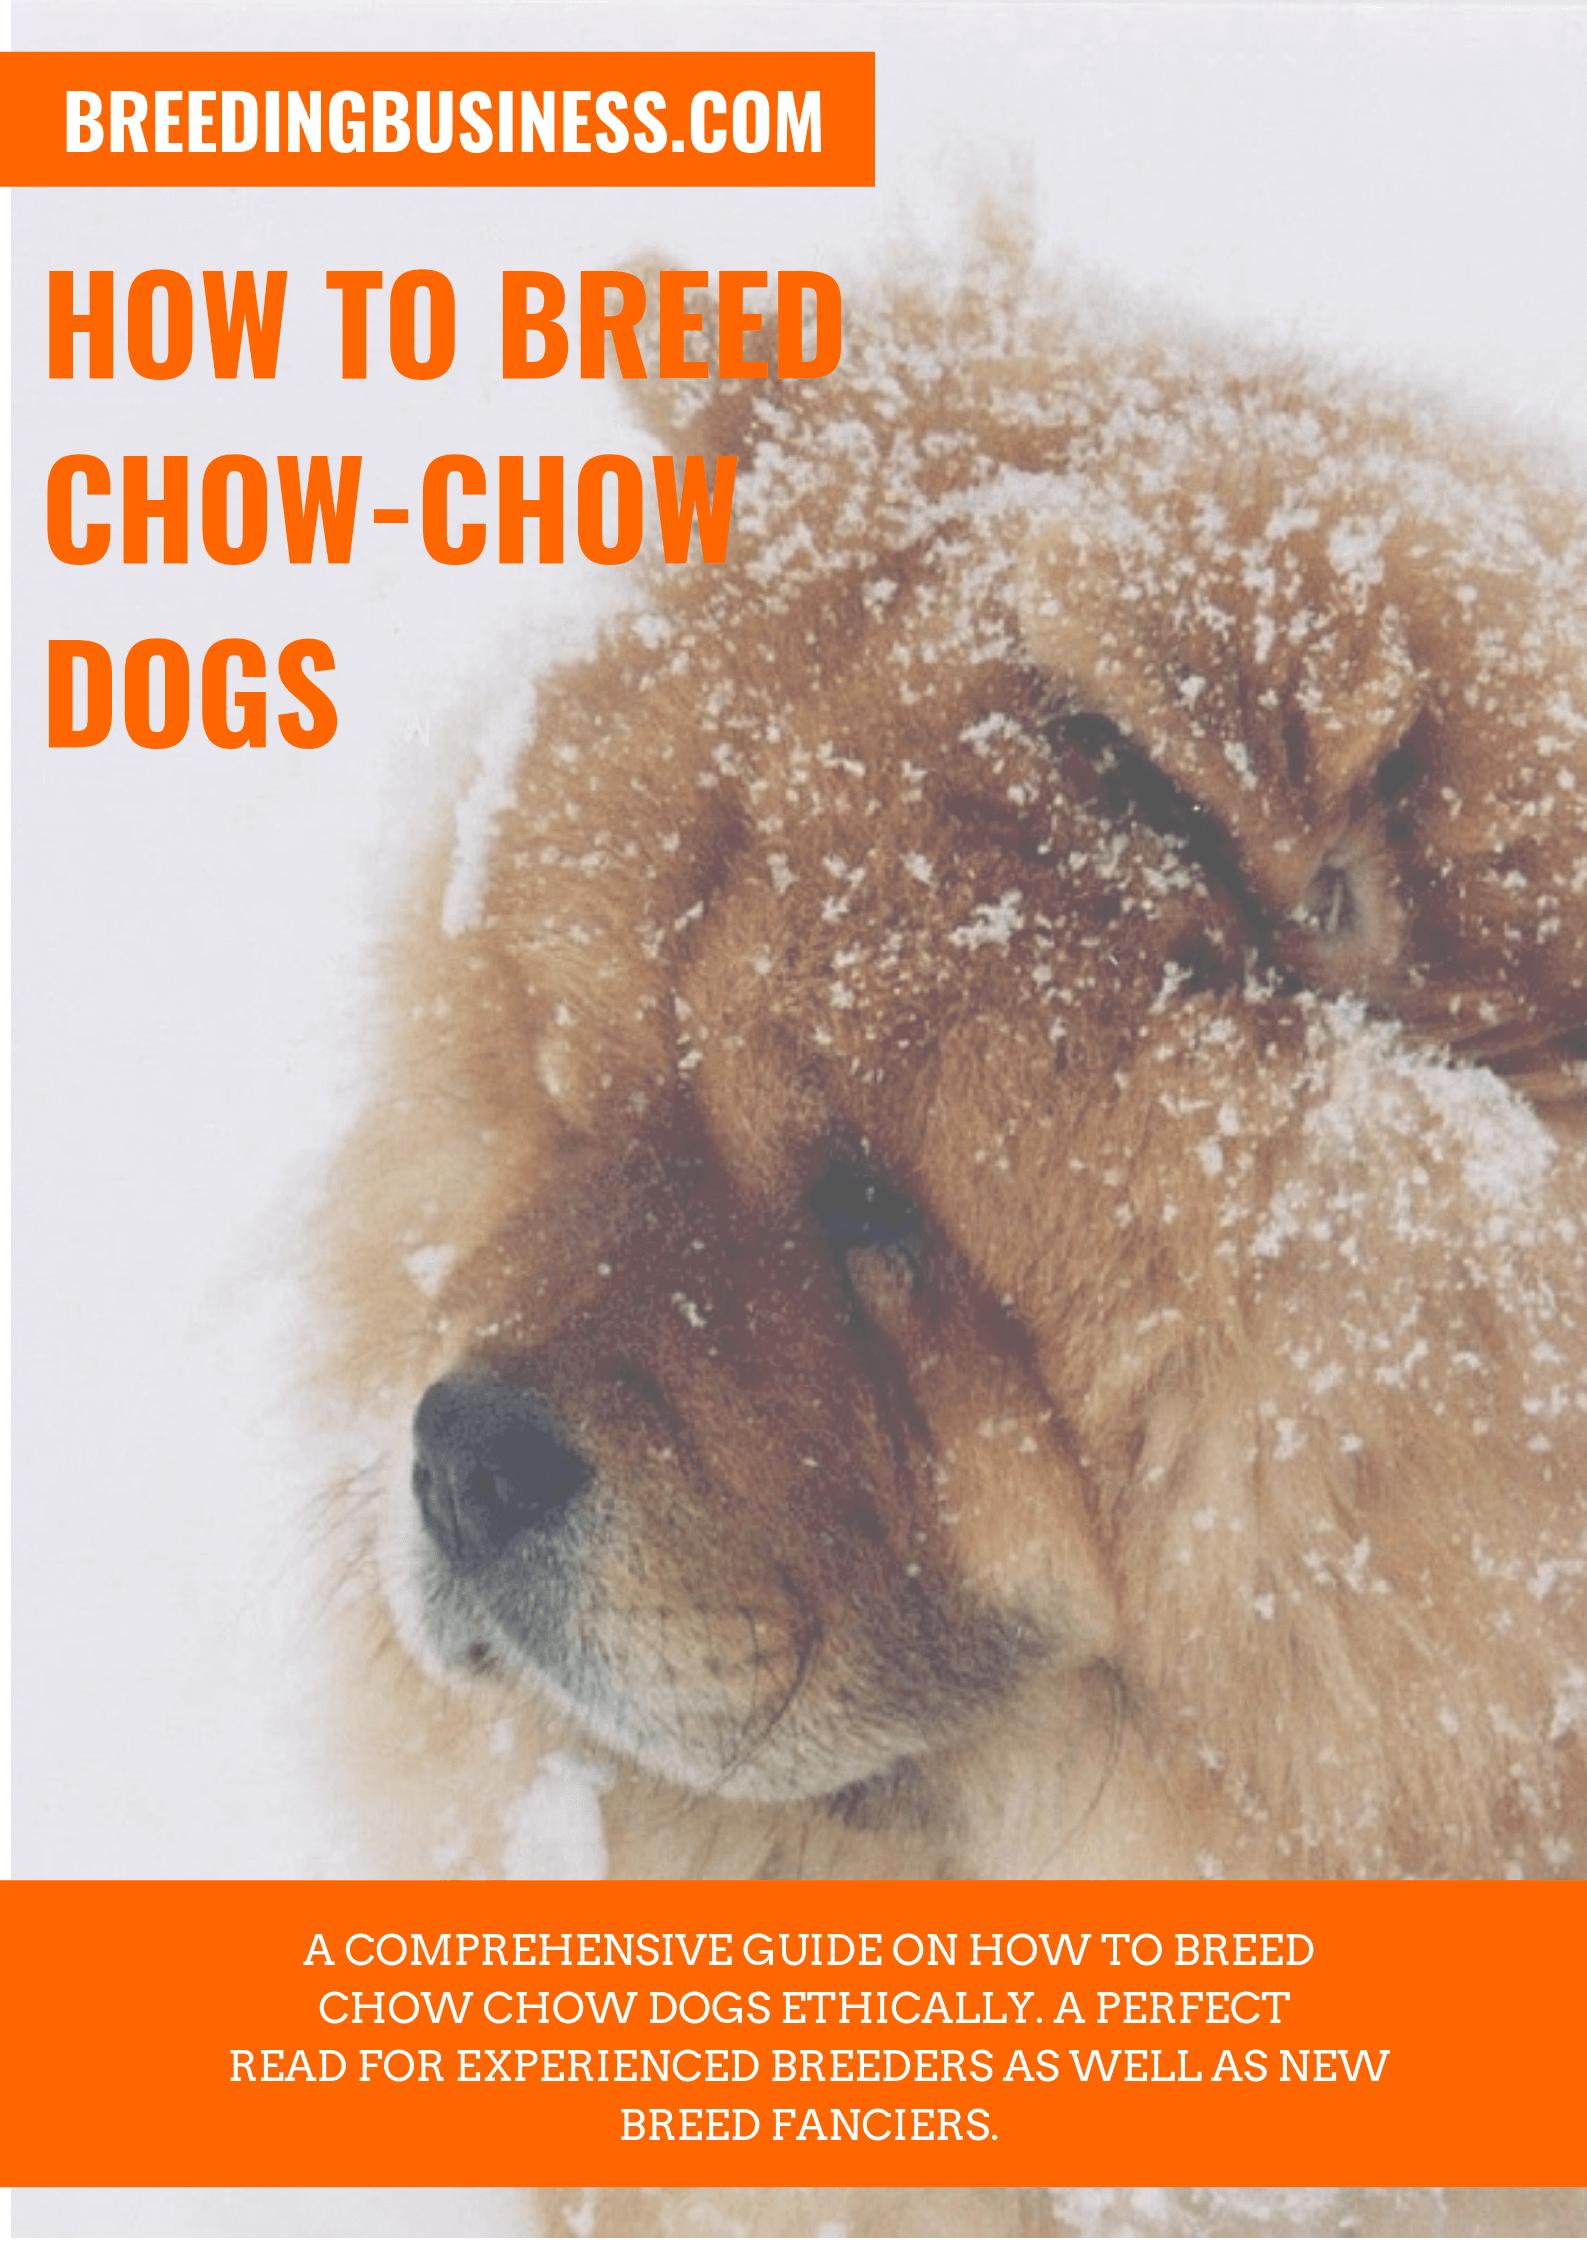 breeding Chow Chows